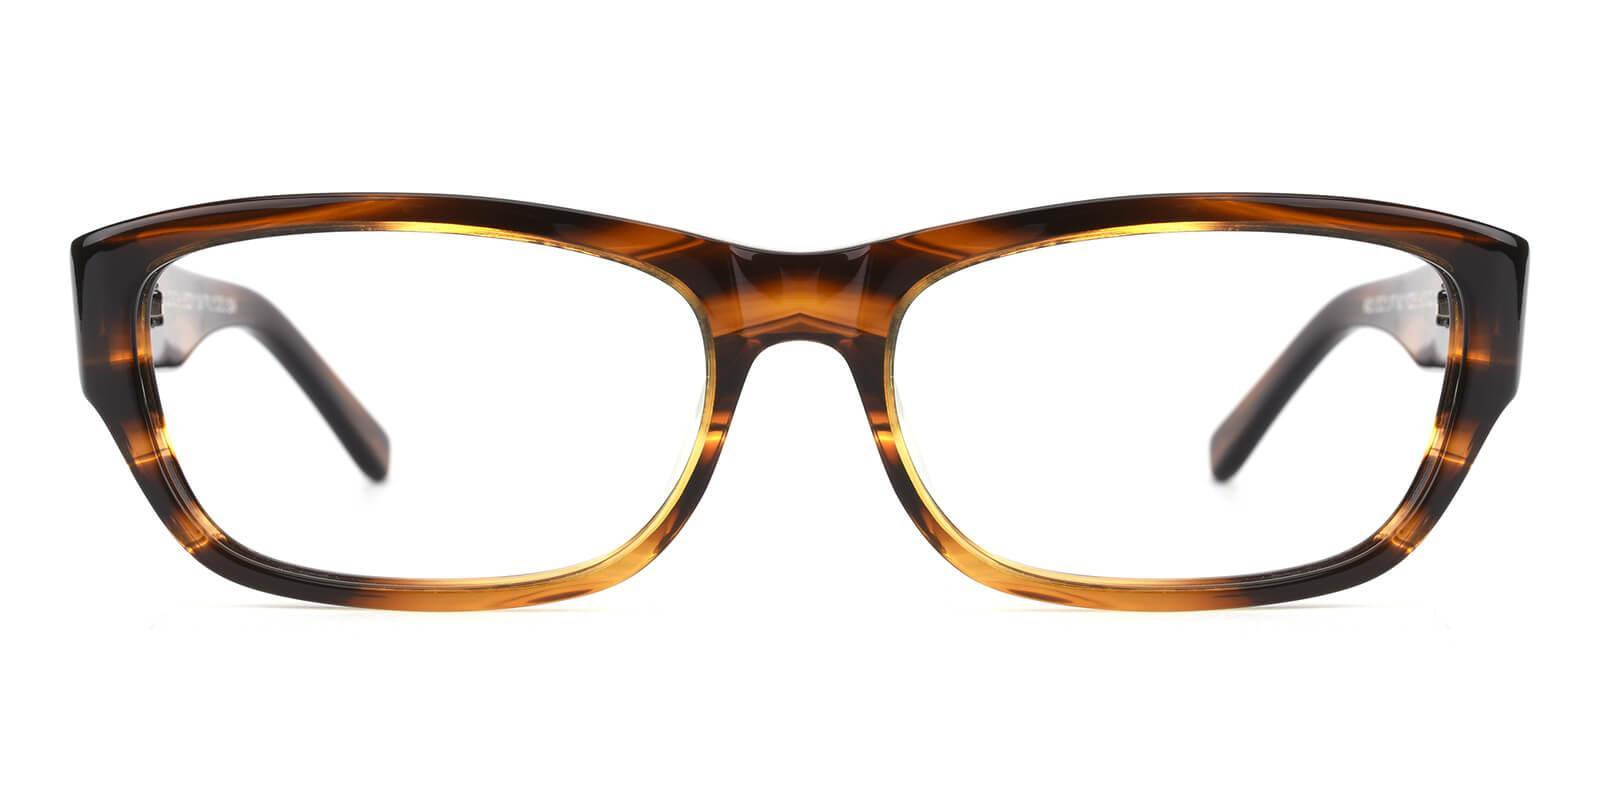 Travis-Tortoise-Rectangle-Acetate-Eyeglasses-additional2